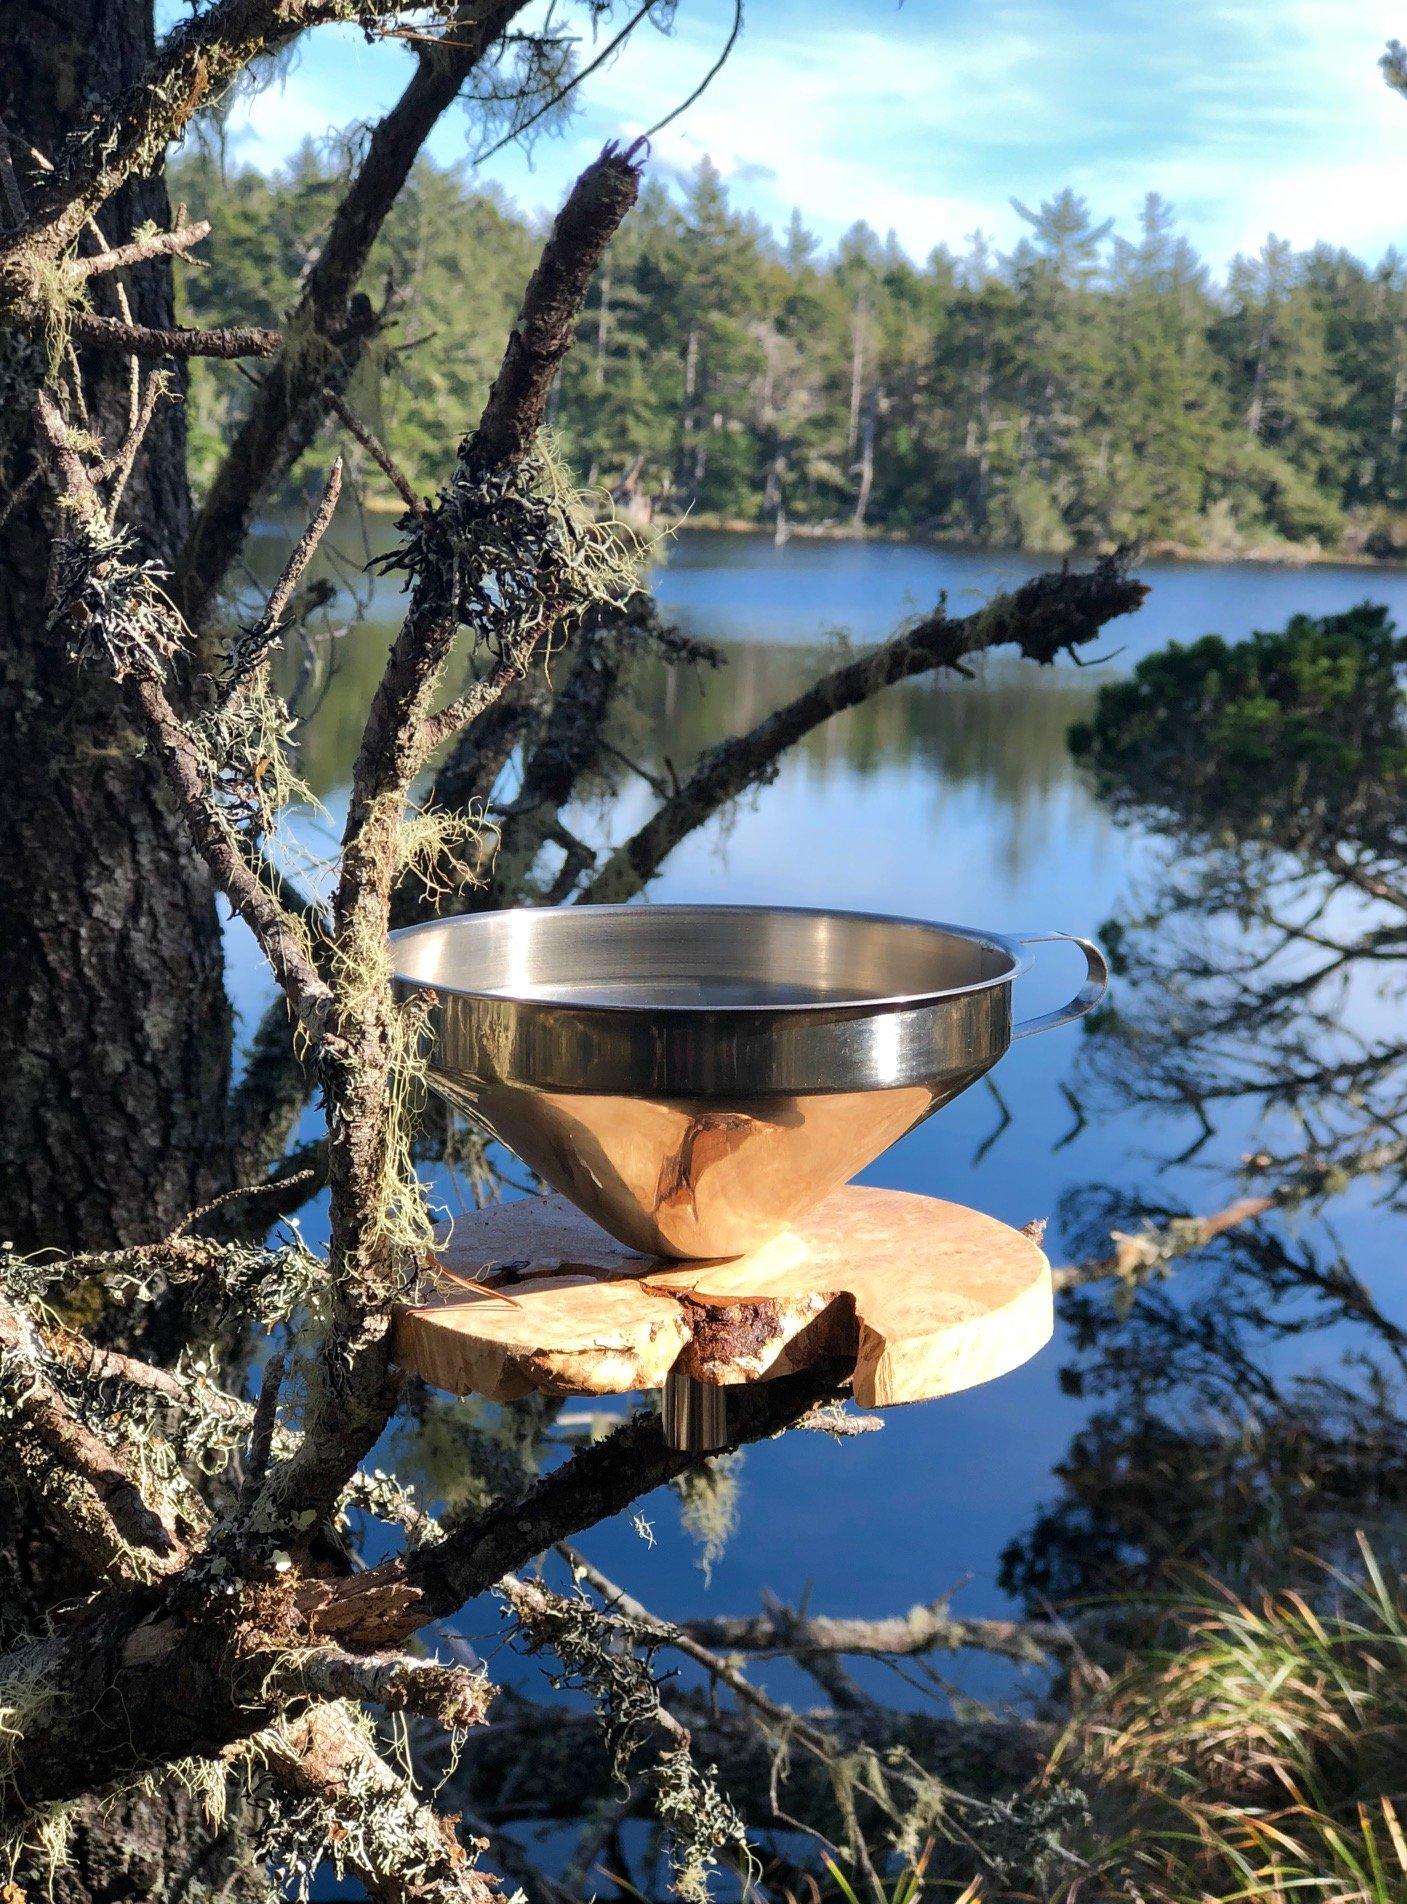 Handmade Wood and Metal Coffee Dripper